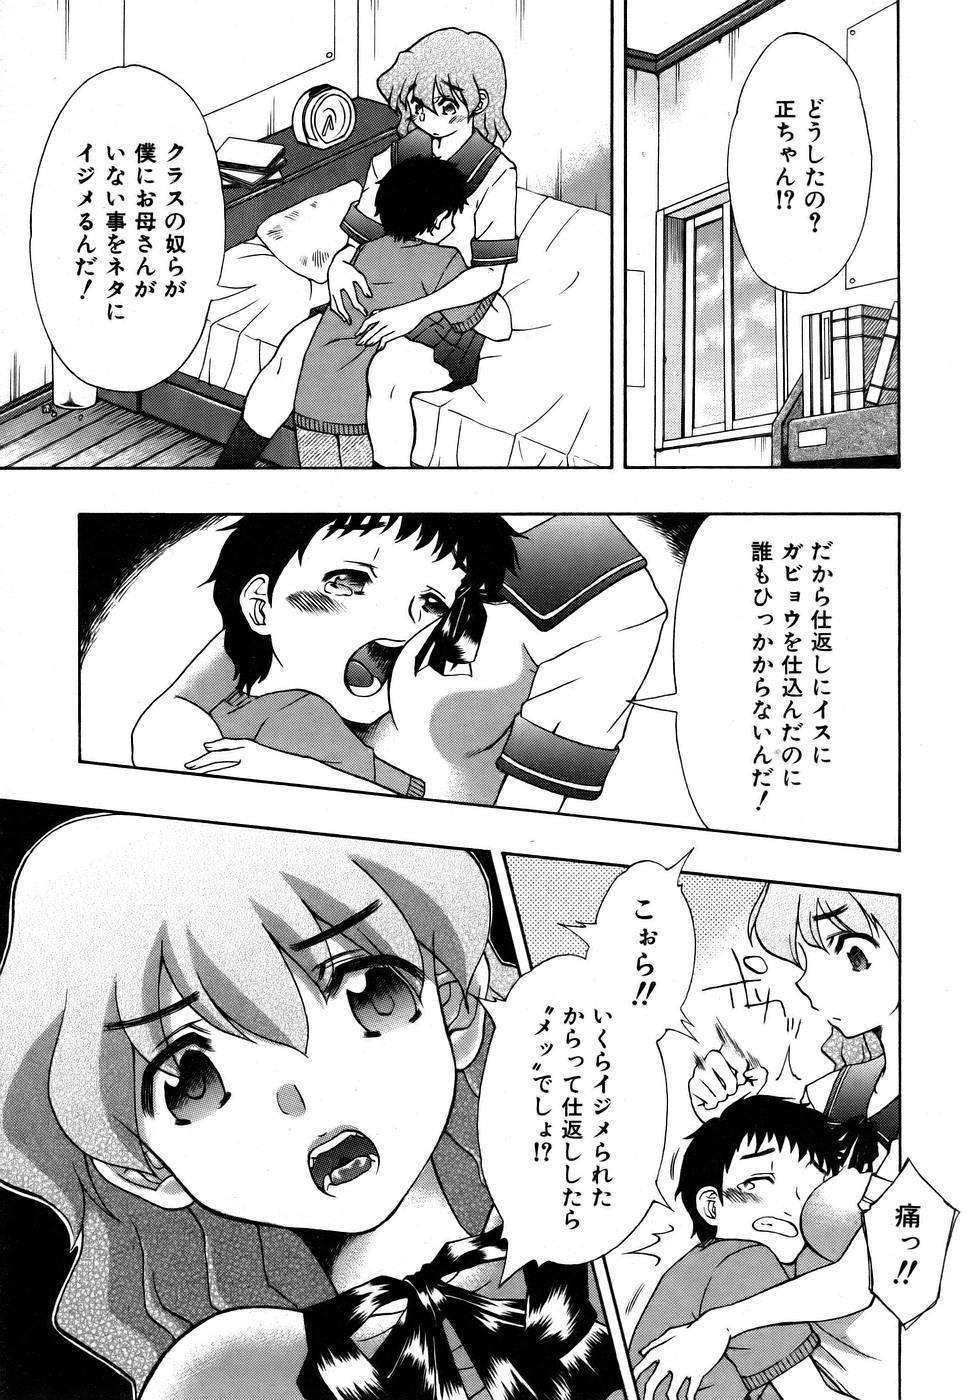 COMIC AUN 2005-12 Vol. 115 378